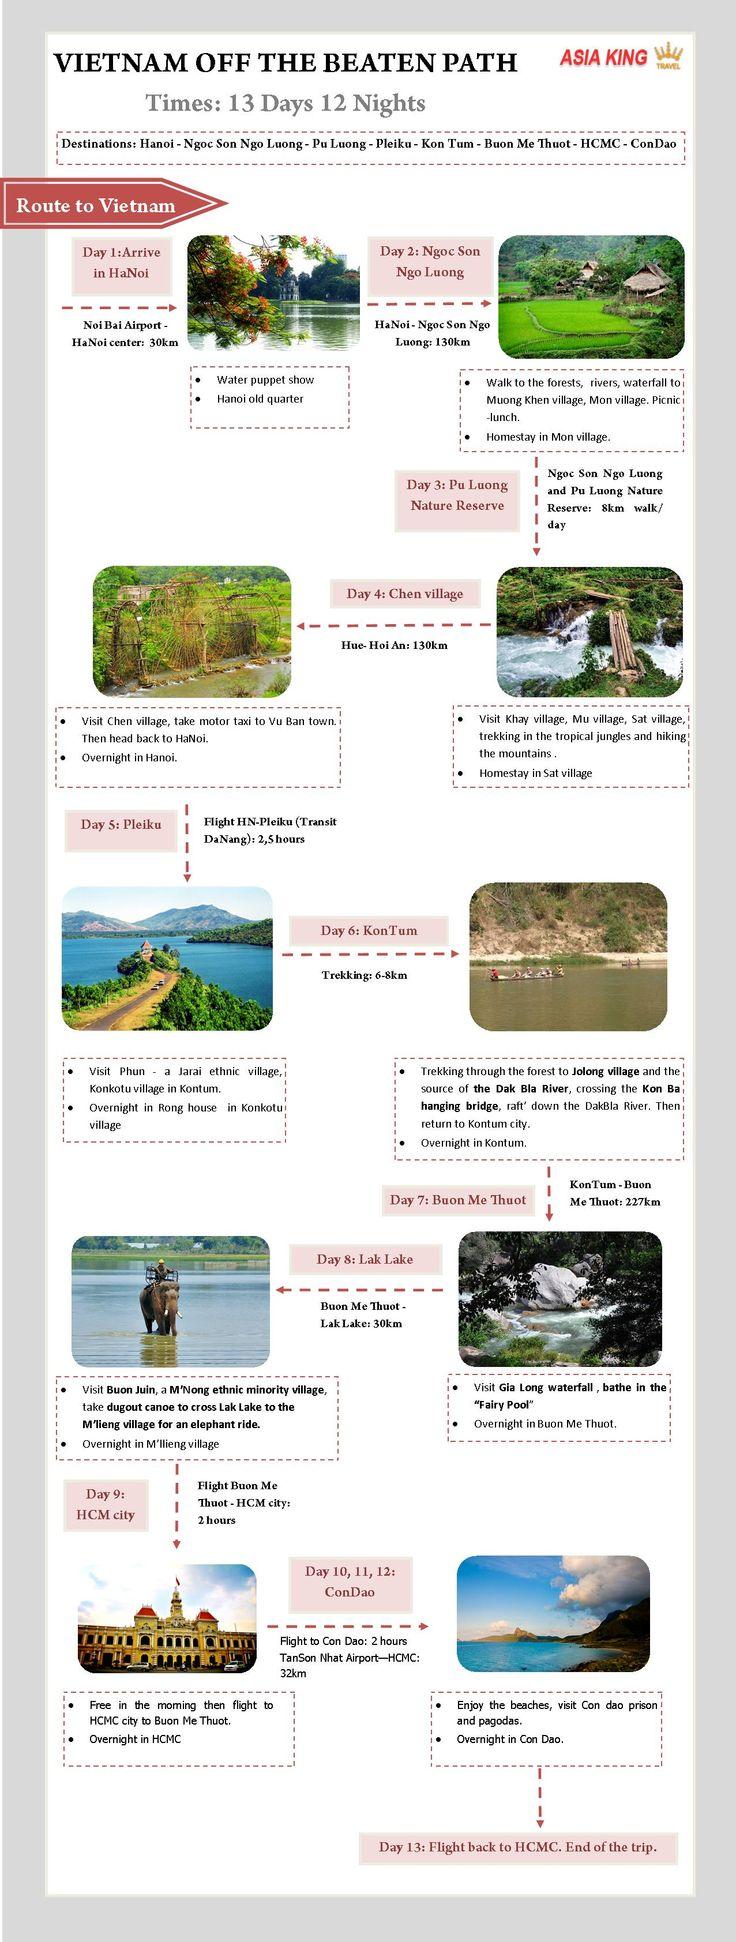 (Adventure) Vietnam Off the Beaten Path 13 Days 12 Nights Destination: HaNoi - Ngoc Son Ngo Luong - Pu Luong - Pleiku - Buon Me Thuot - Kontum - Sai Gon - Con Dao